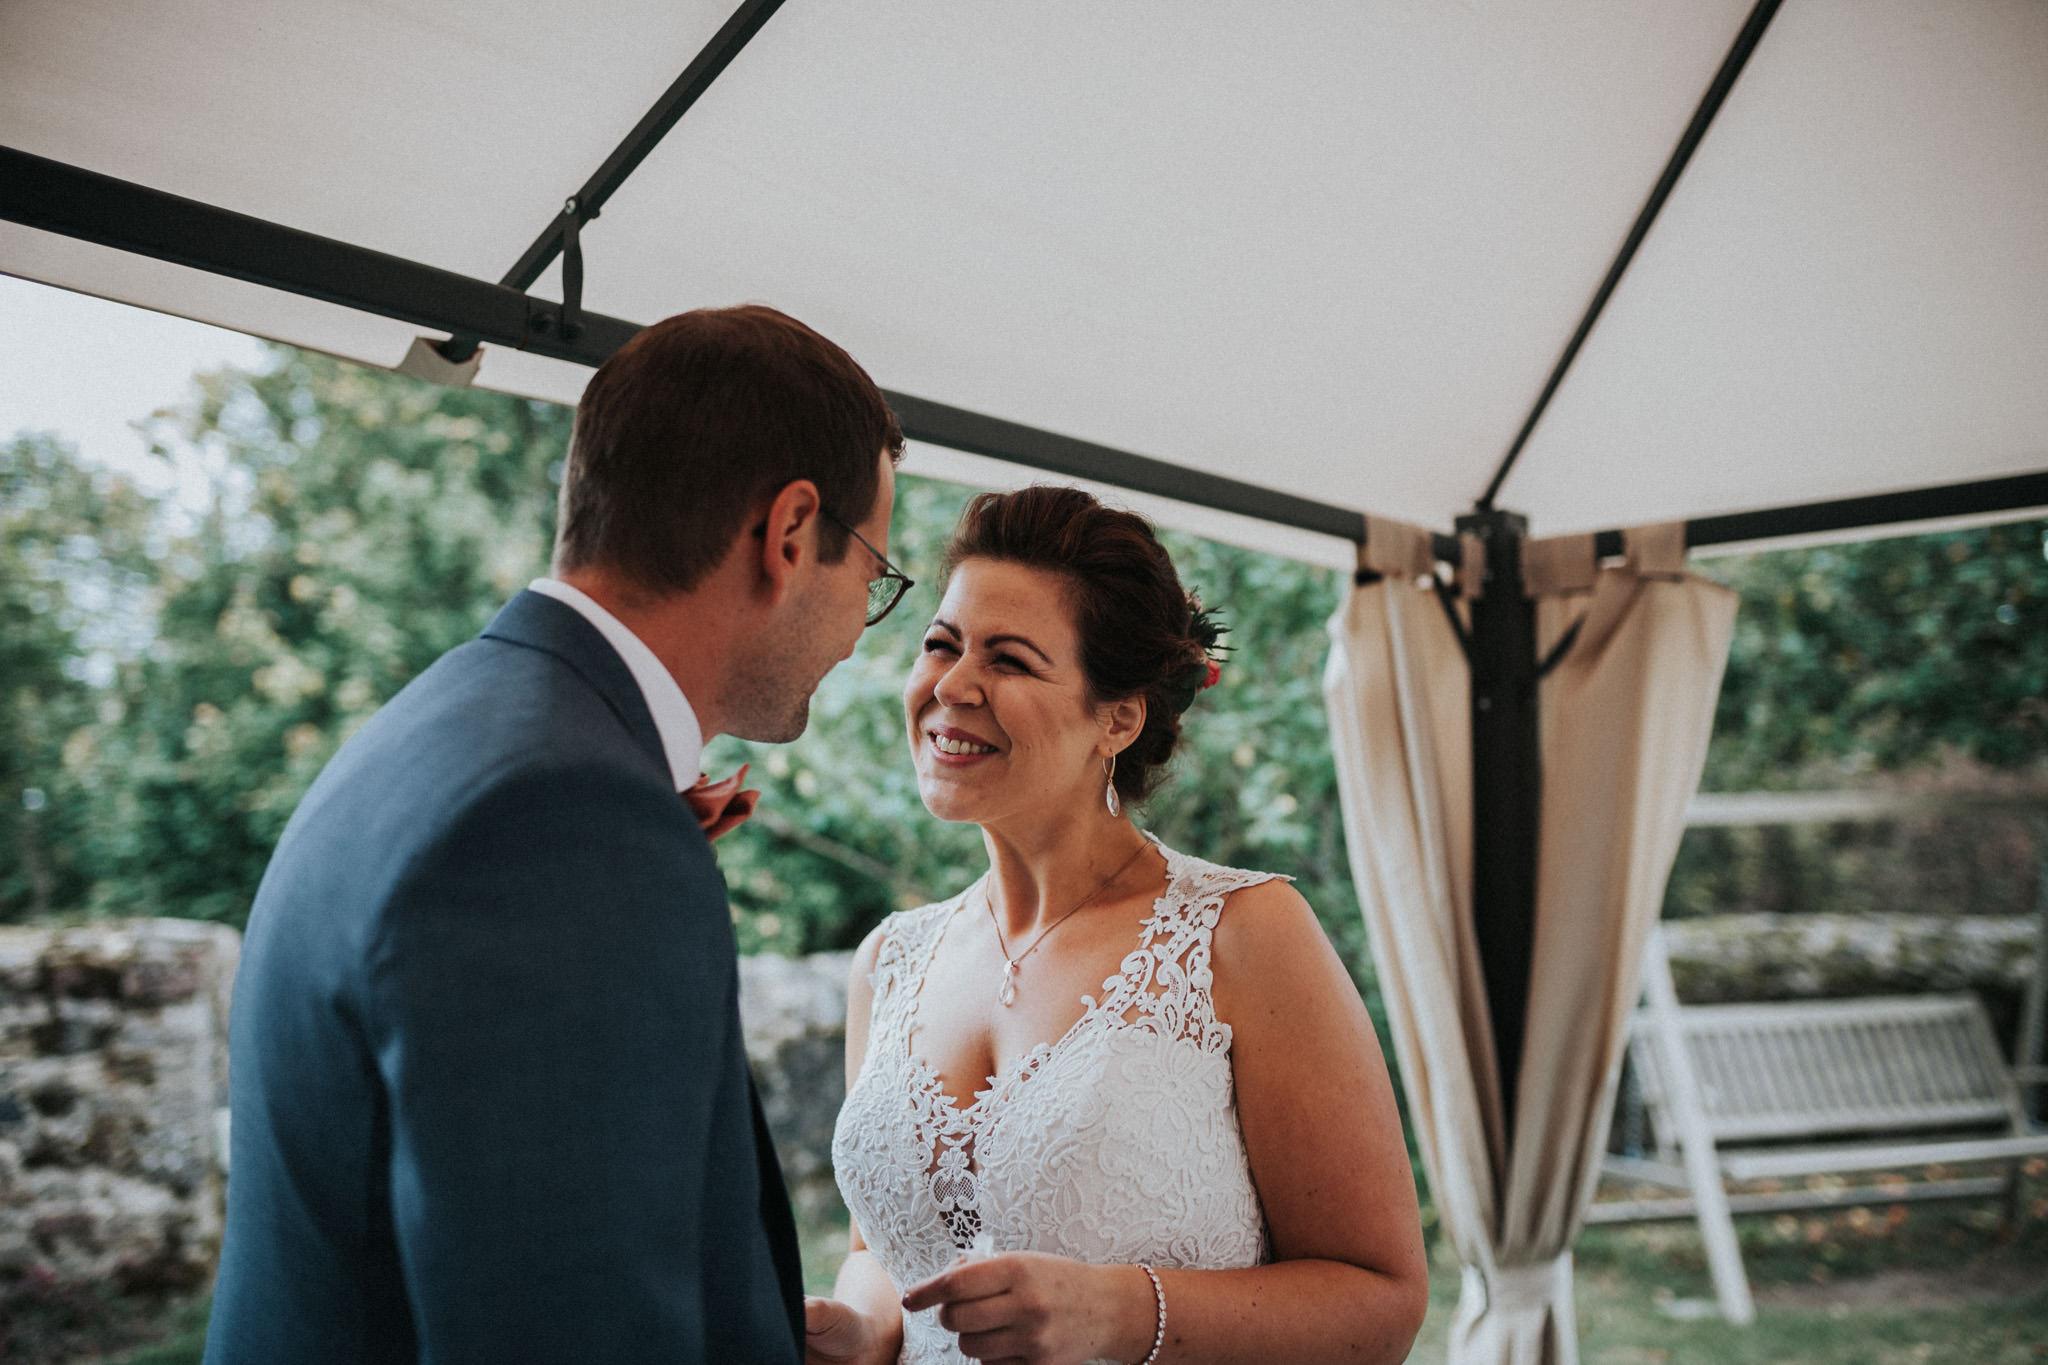 Hochzeitsfotograf-Homberg-36.jpg